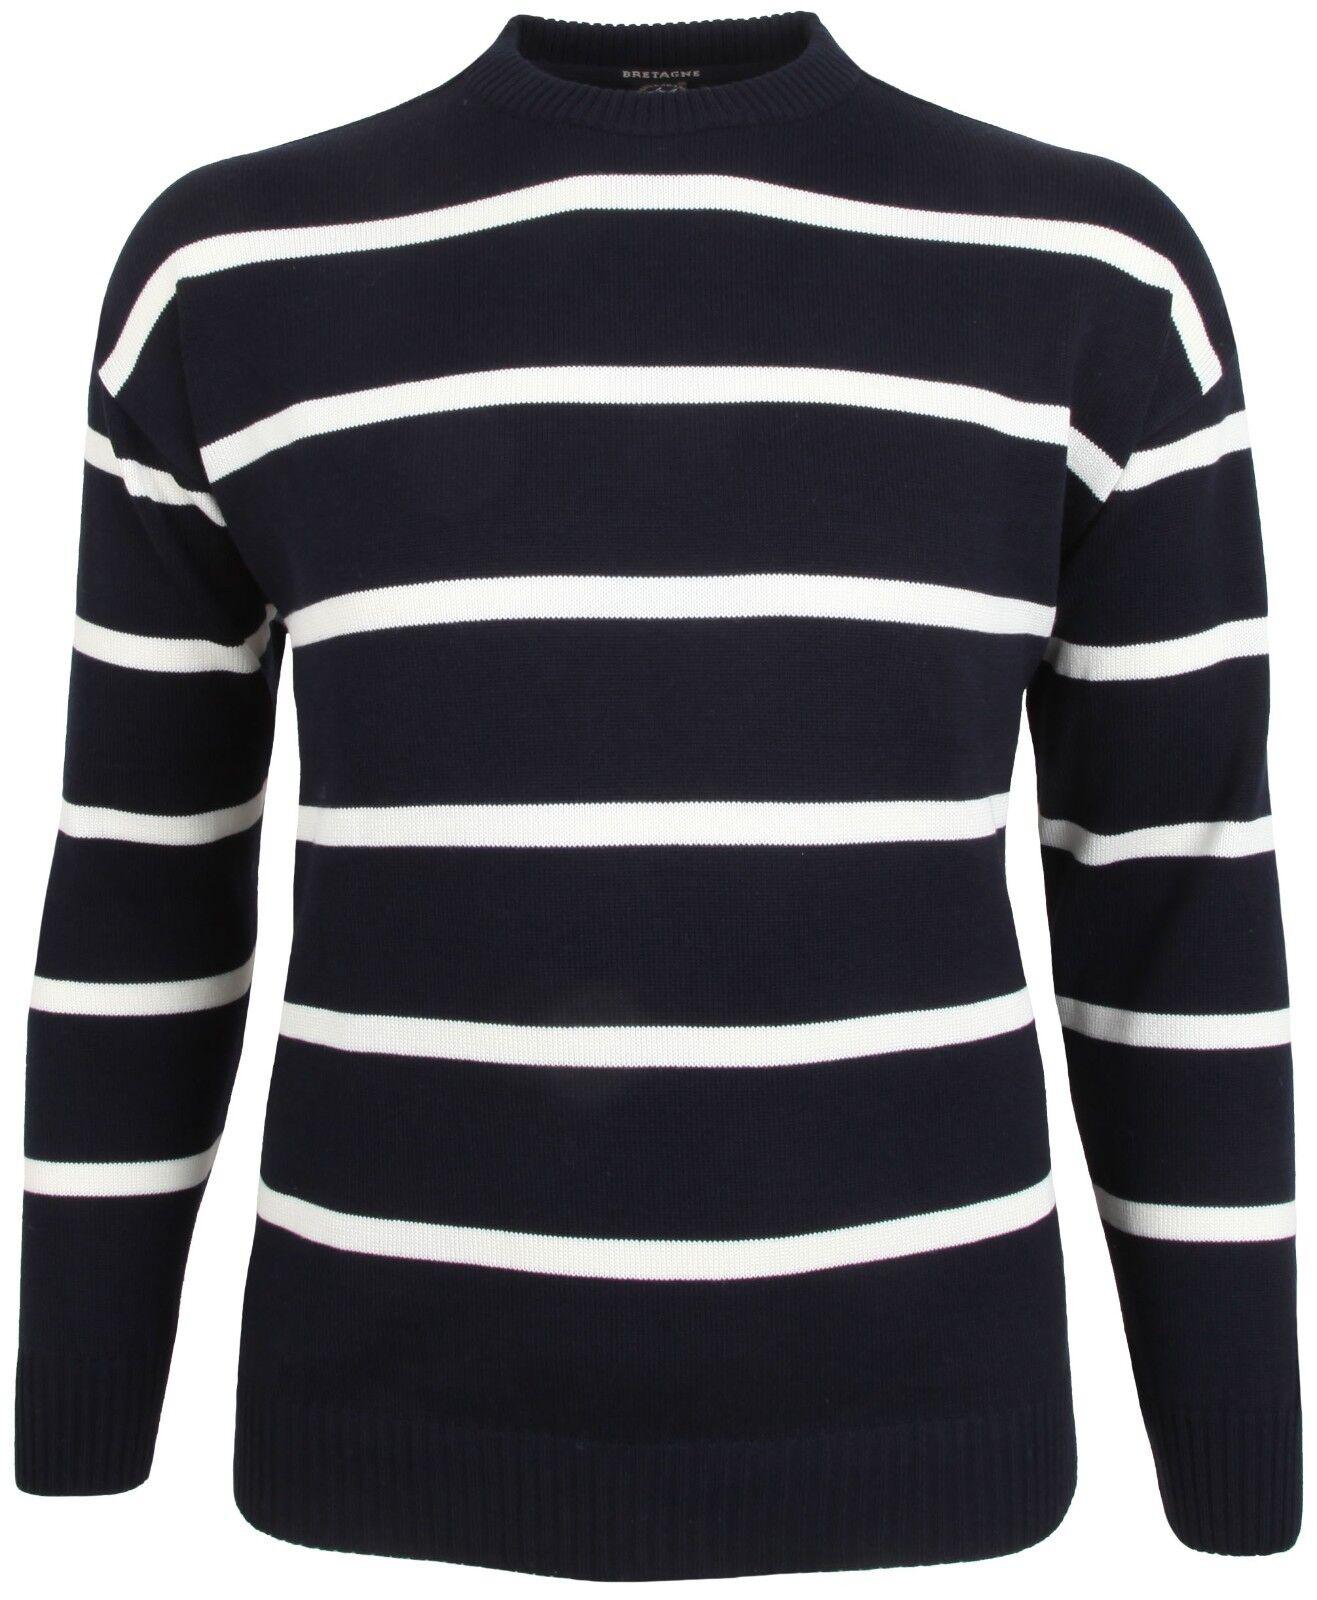 PAUL & SHARK YACHTING Pullover Sweater Rundhals Gr. 4XL BRETAGNE Wolle Wool Blau